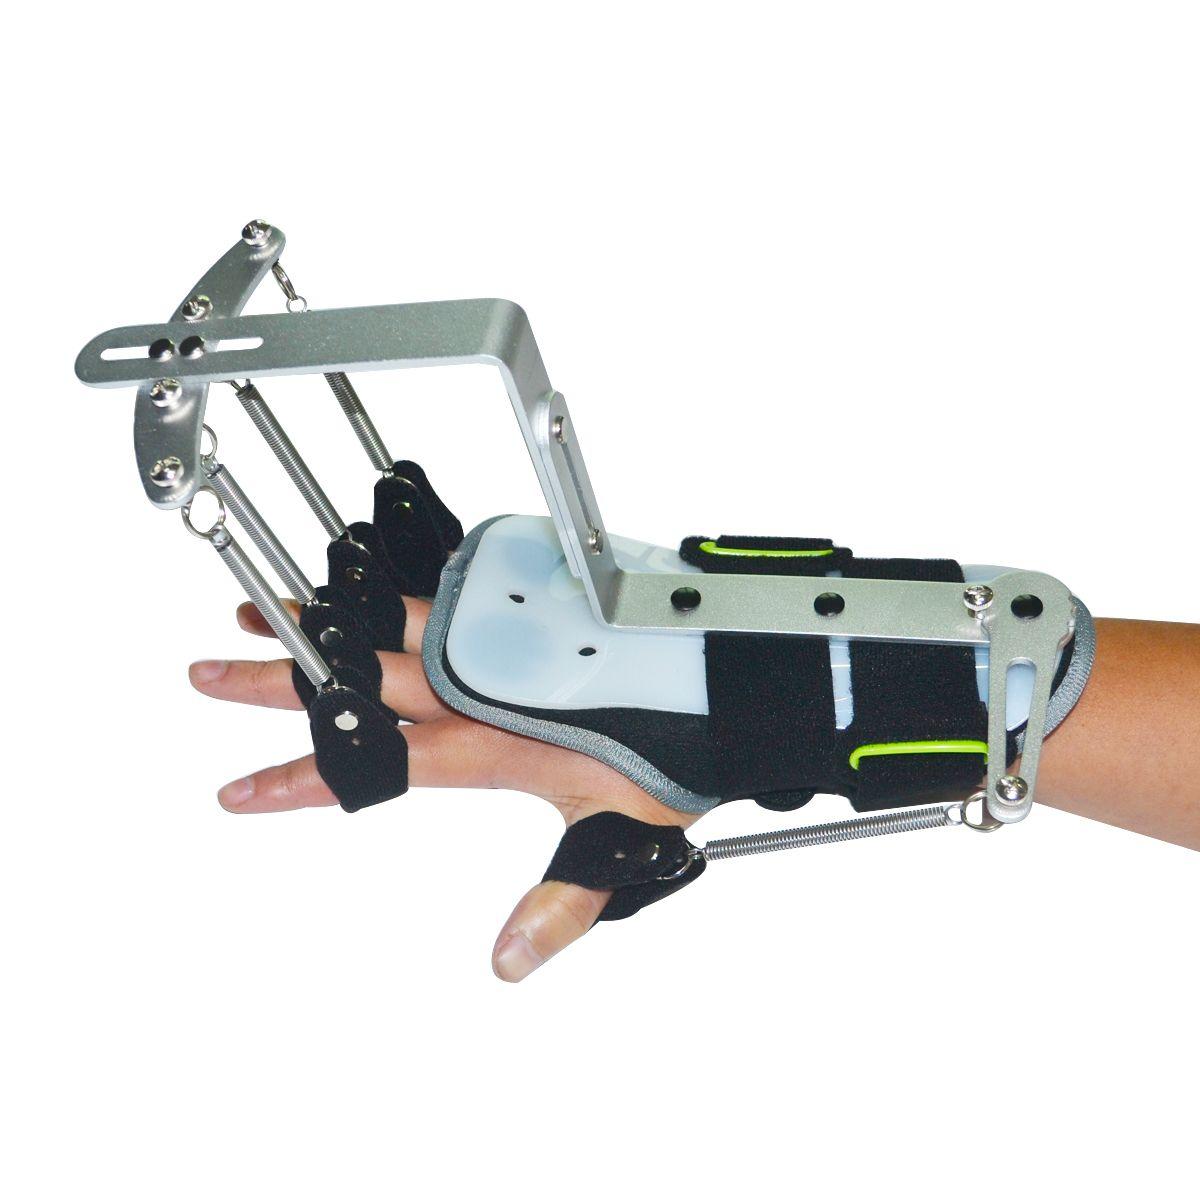 New Version Finger & Wrist Orthotics Exerciser Physiotherapy Rehabilitation Dynamic Wrist Support Brace For Hemiplegia Patient